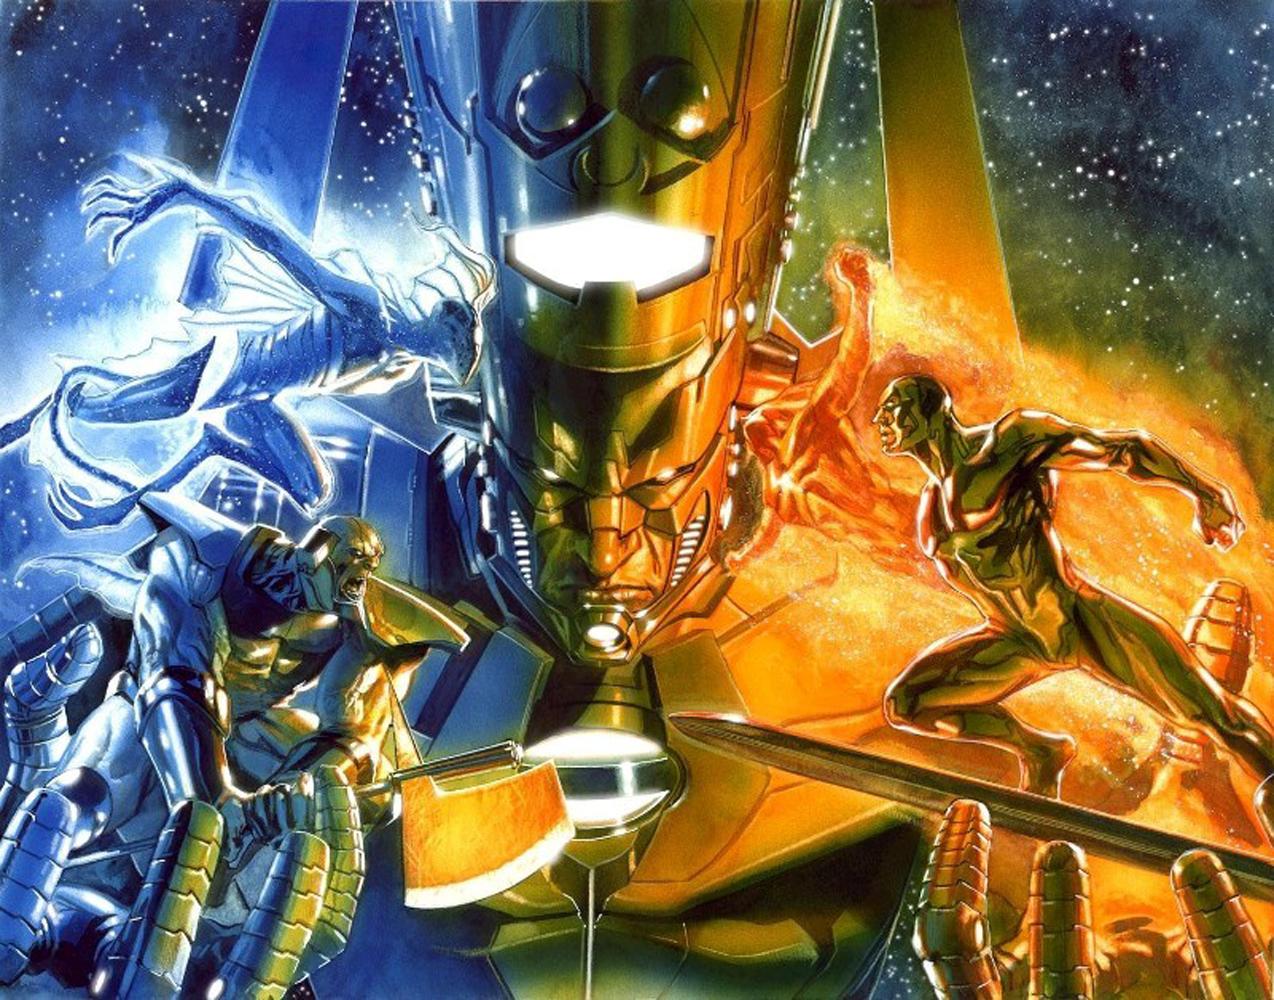 Heralds of Galactus (Earth-616)/Gallery